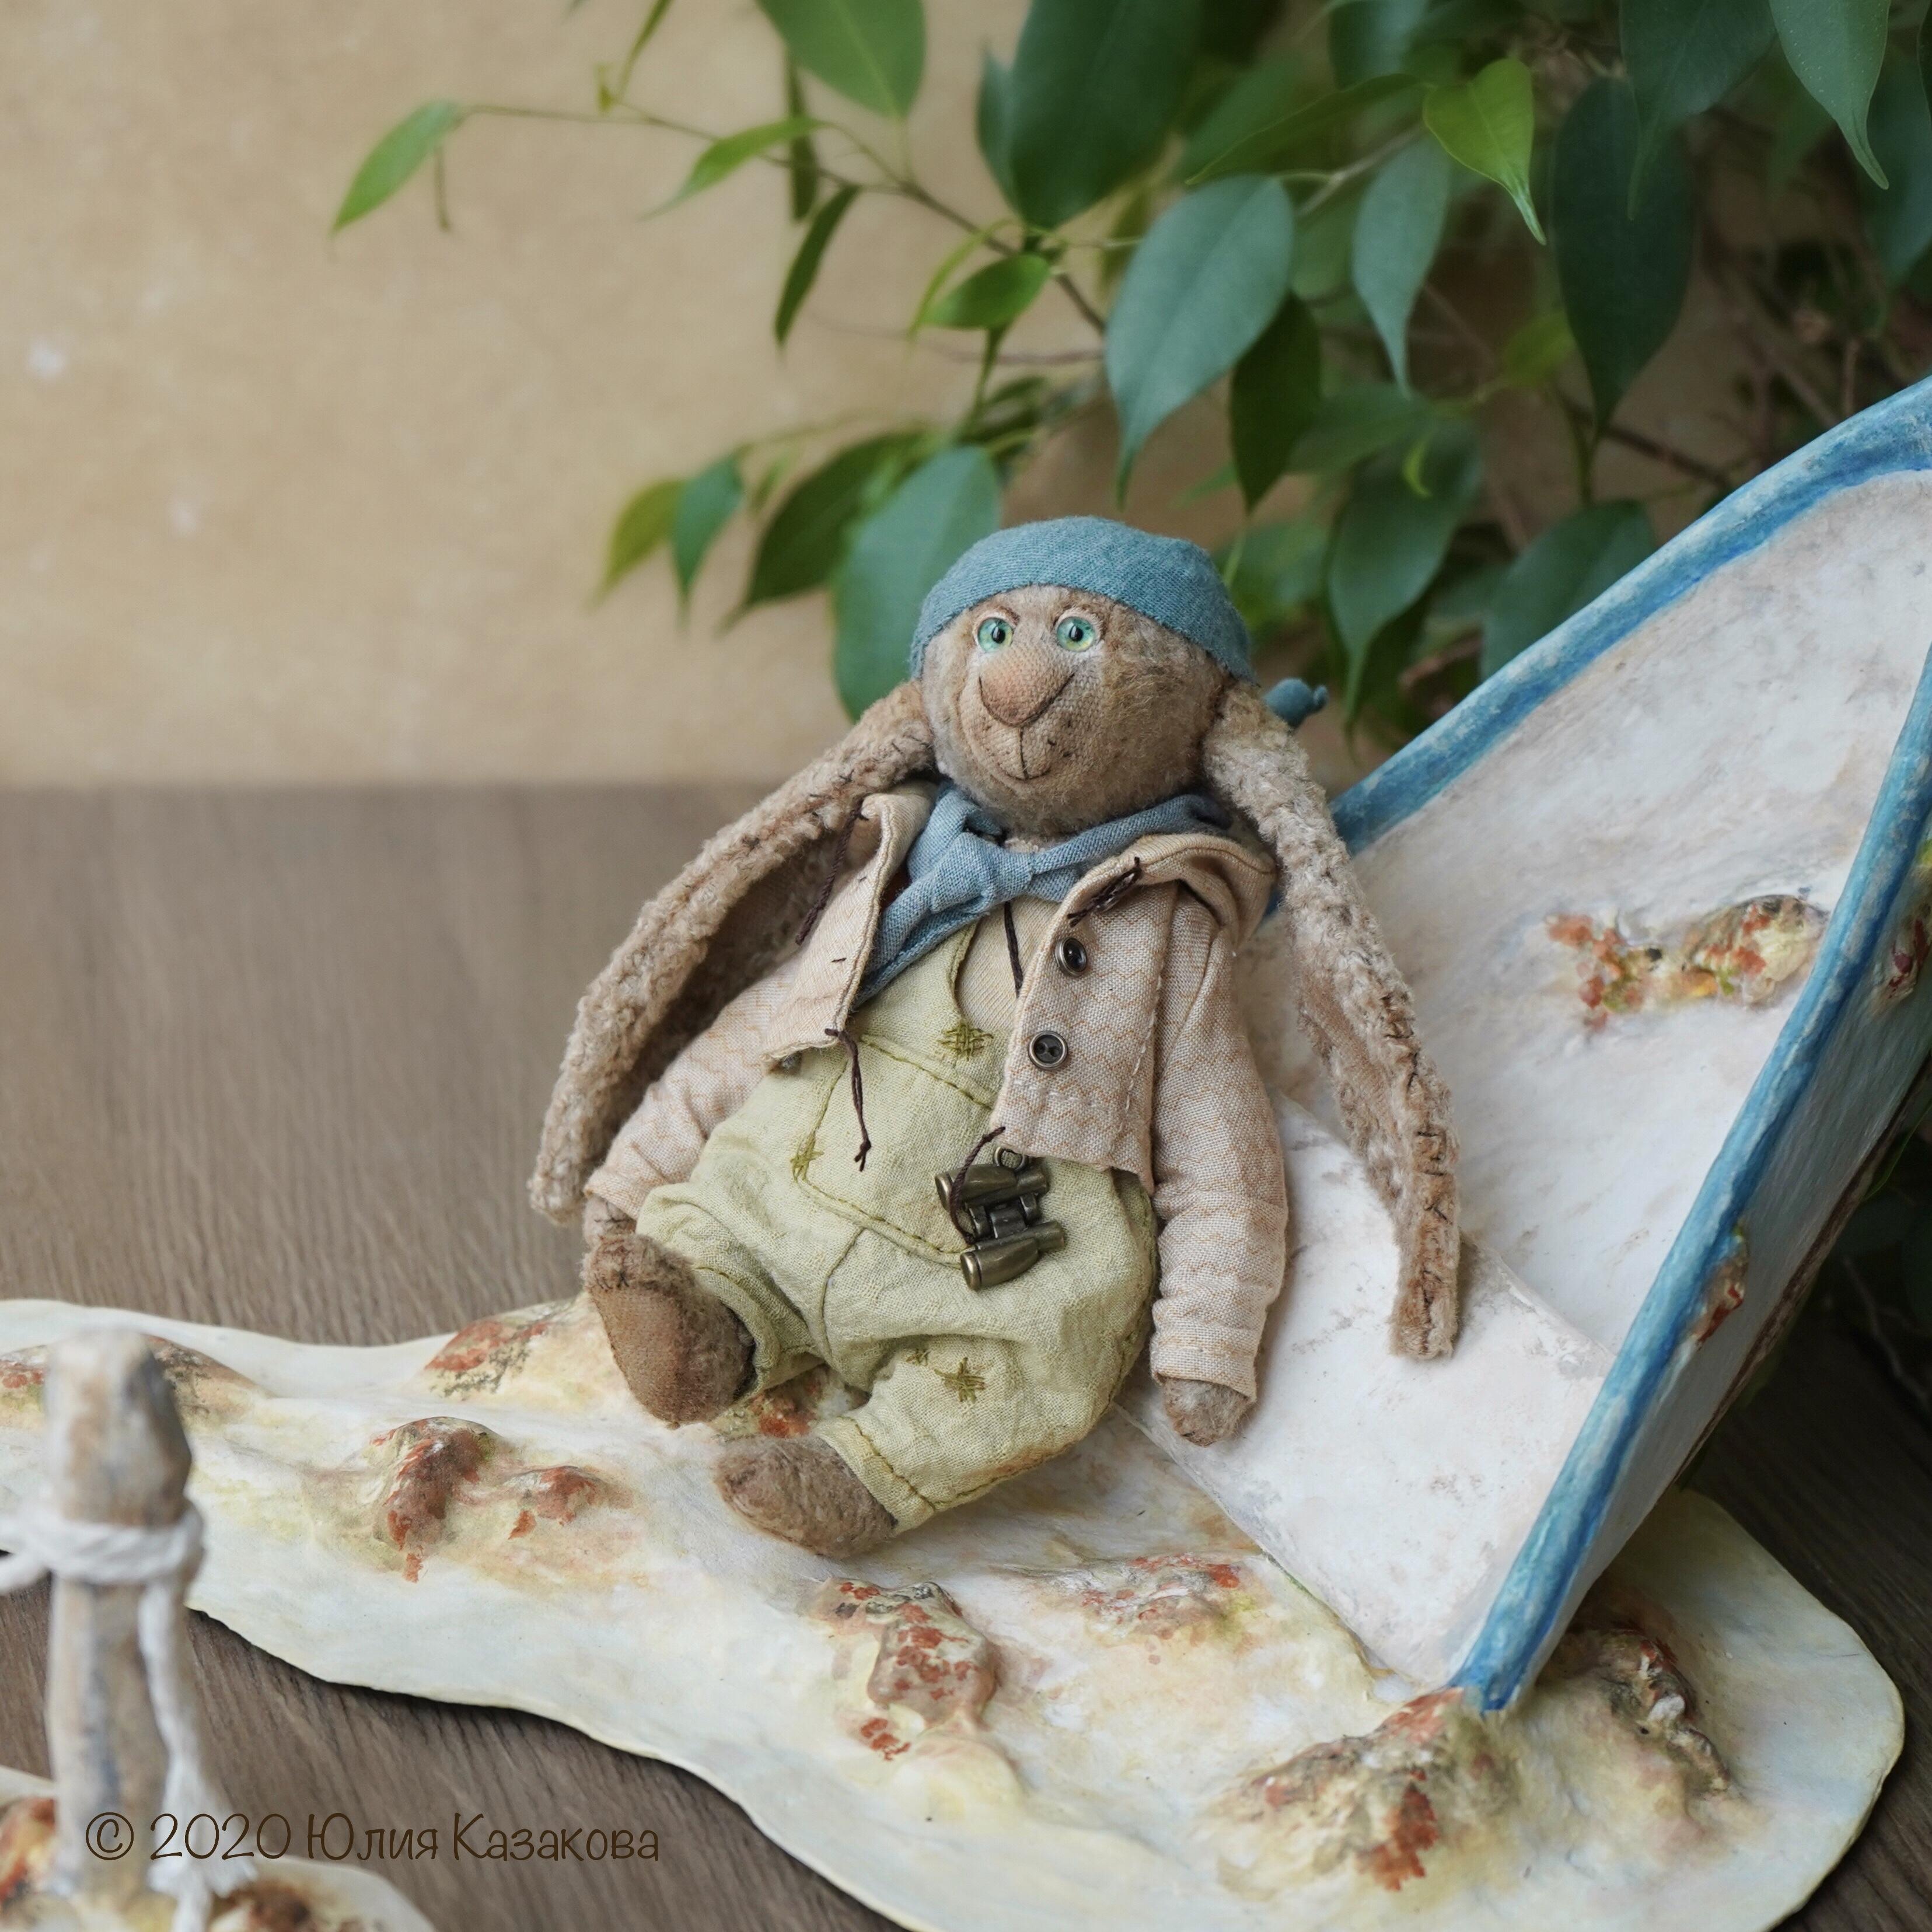 Teddy-hare Yagi